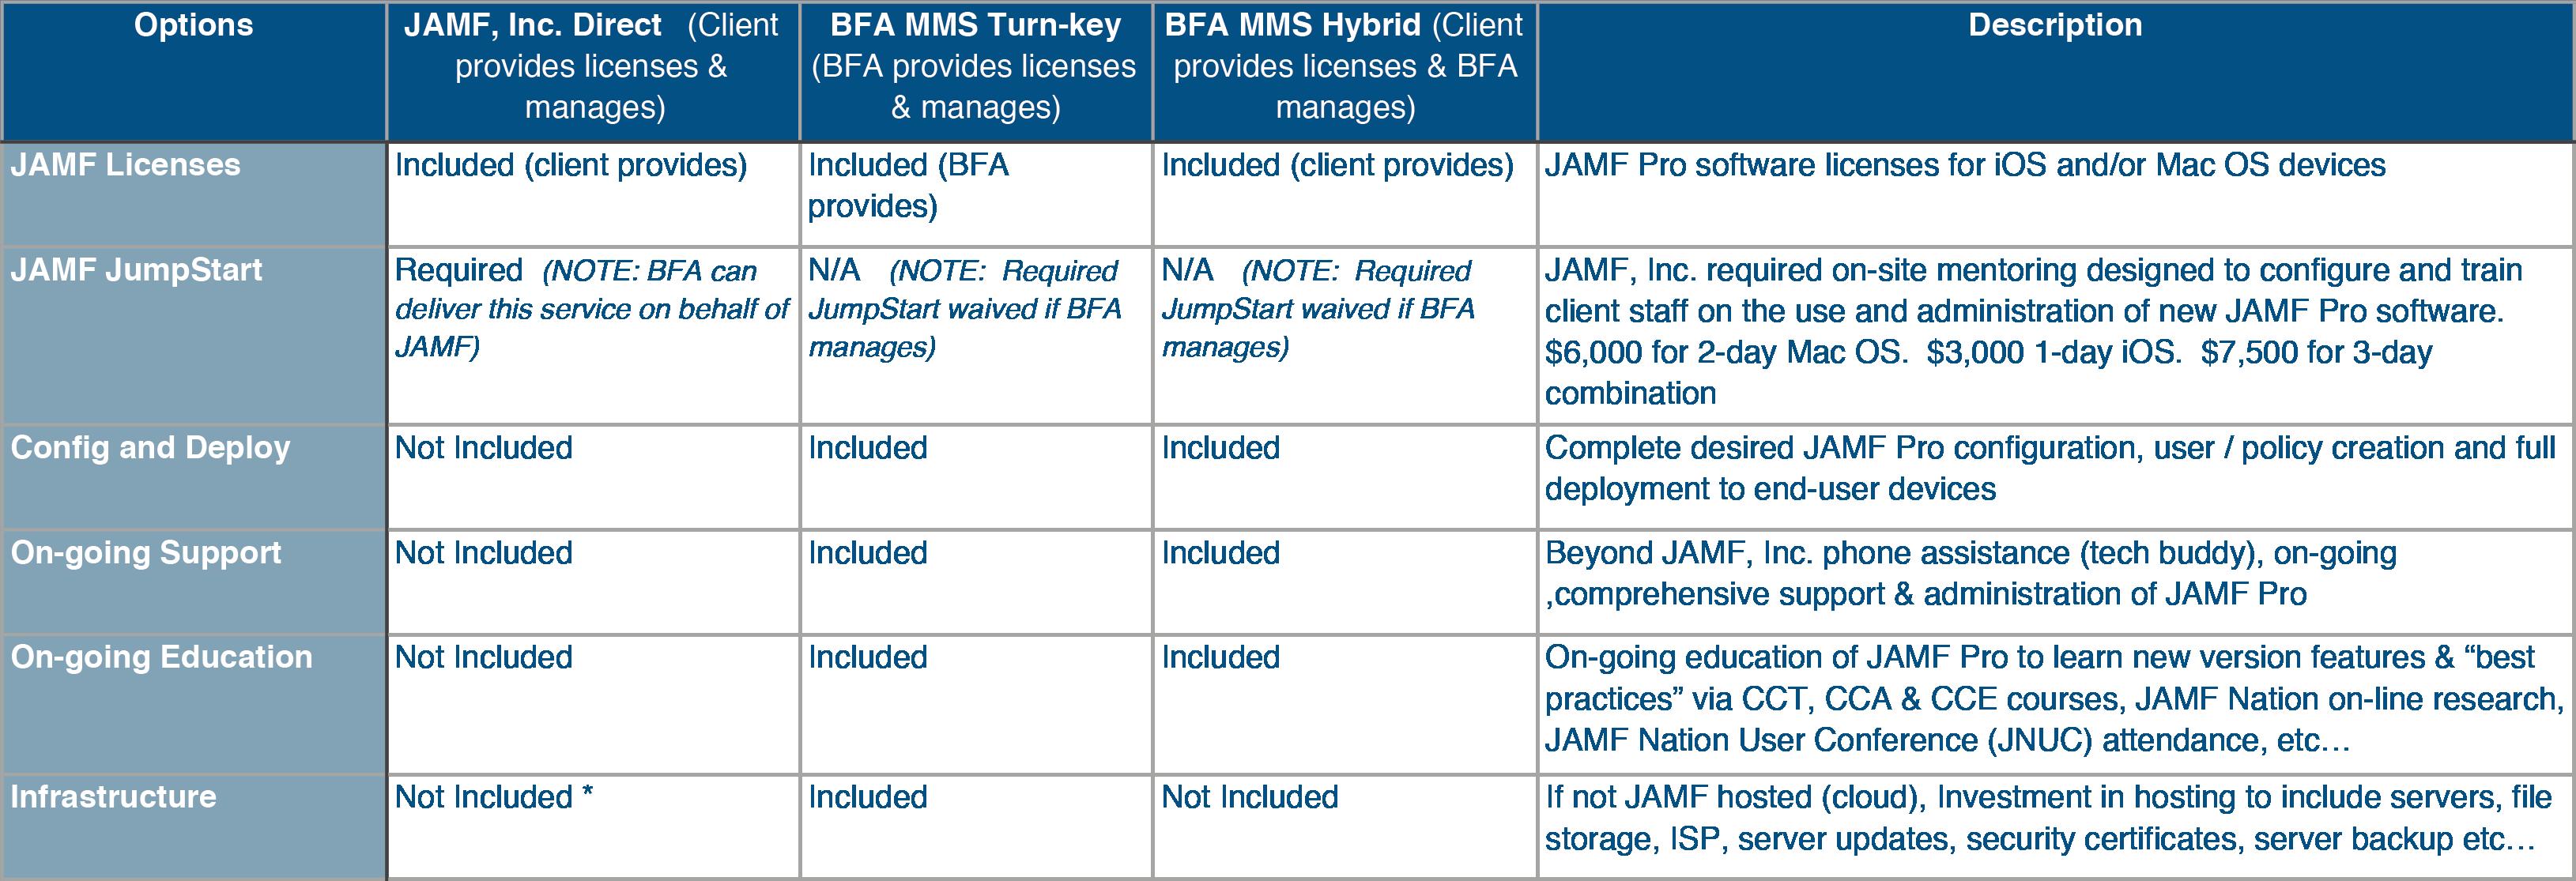 Jamf Pro Support Options Matrix